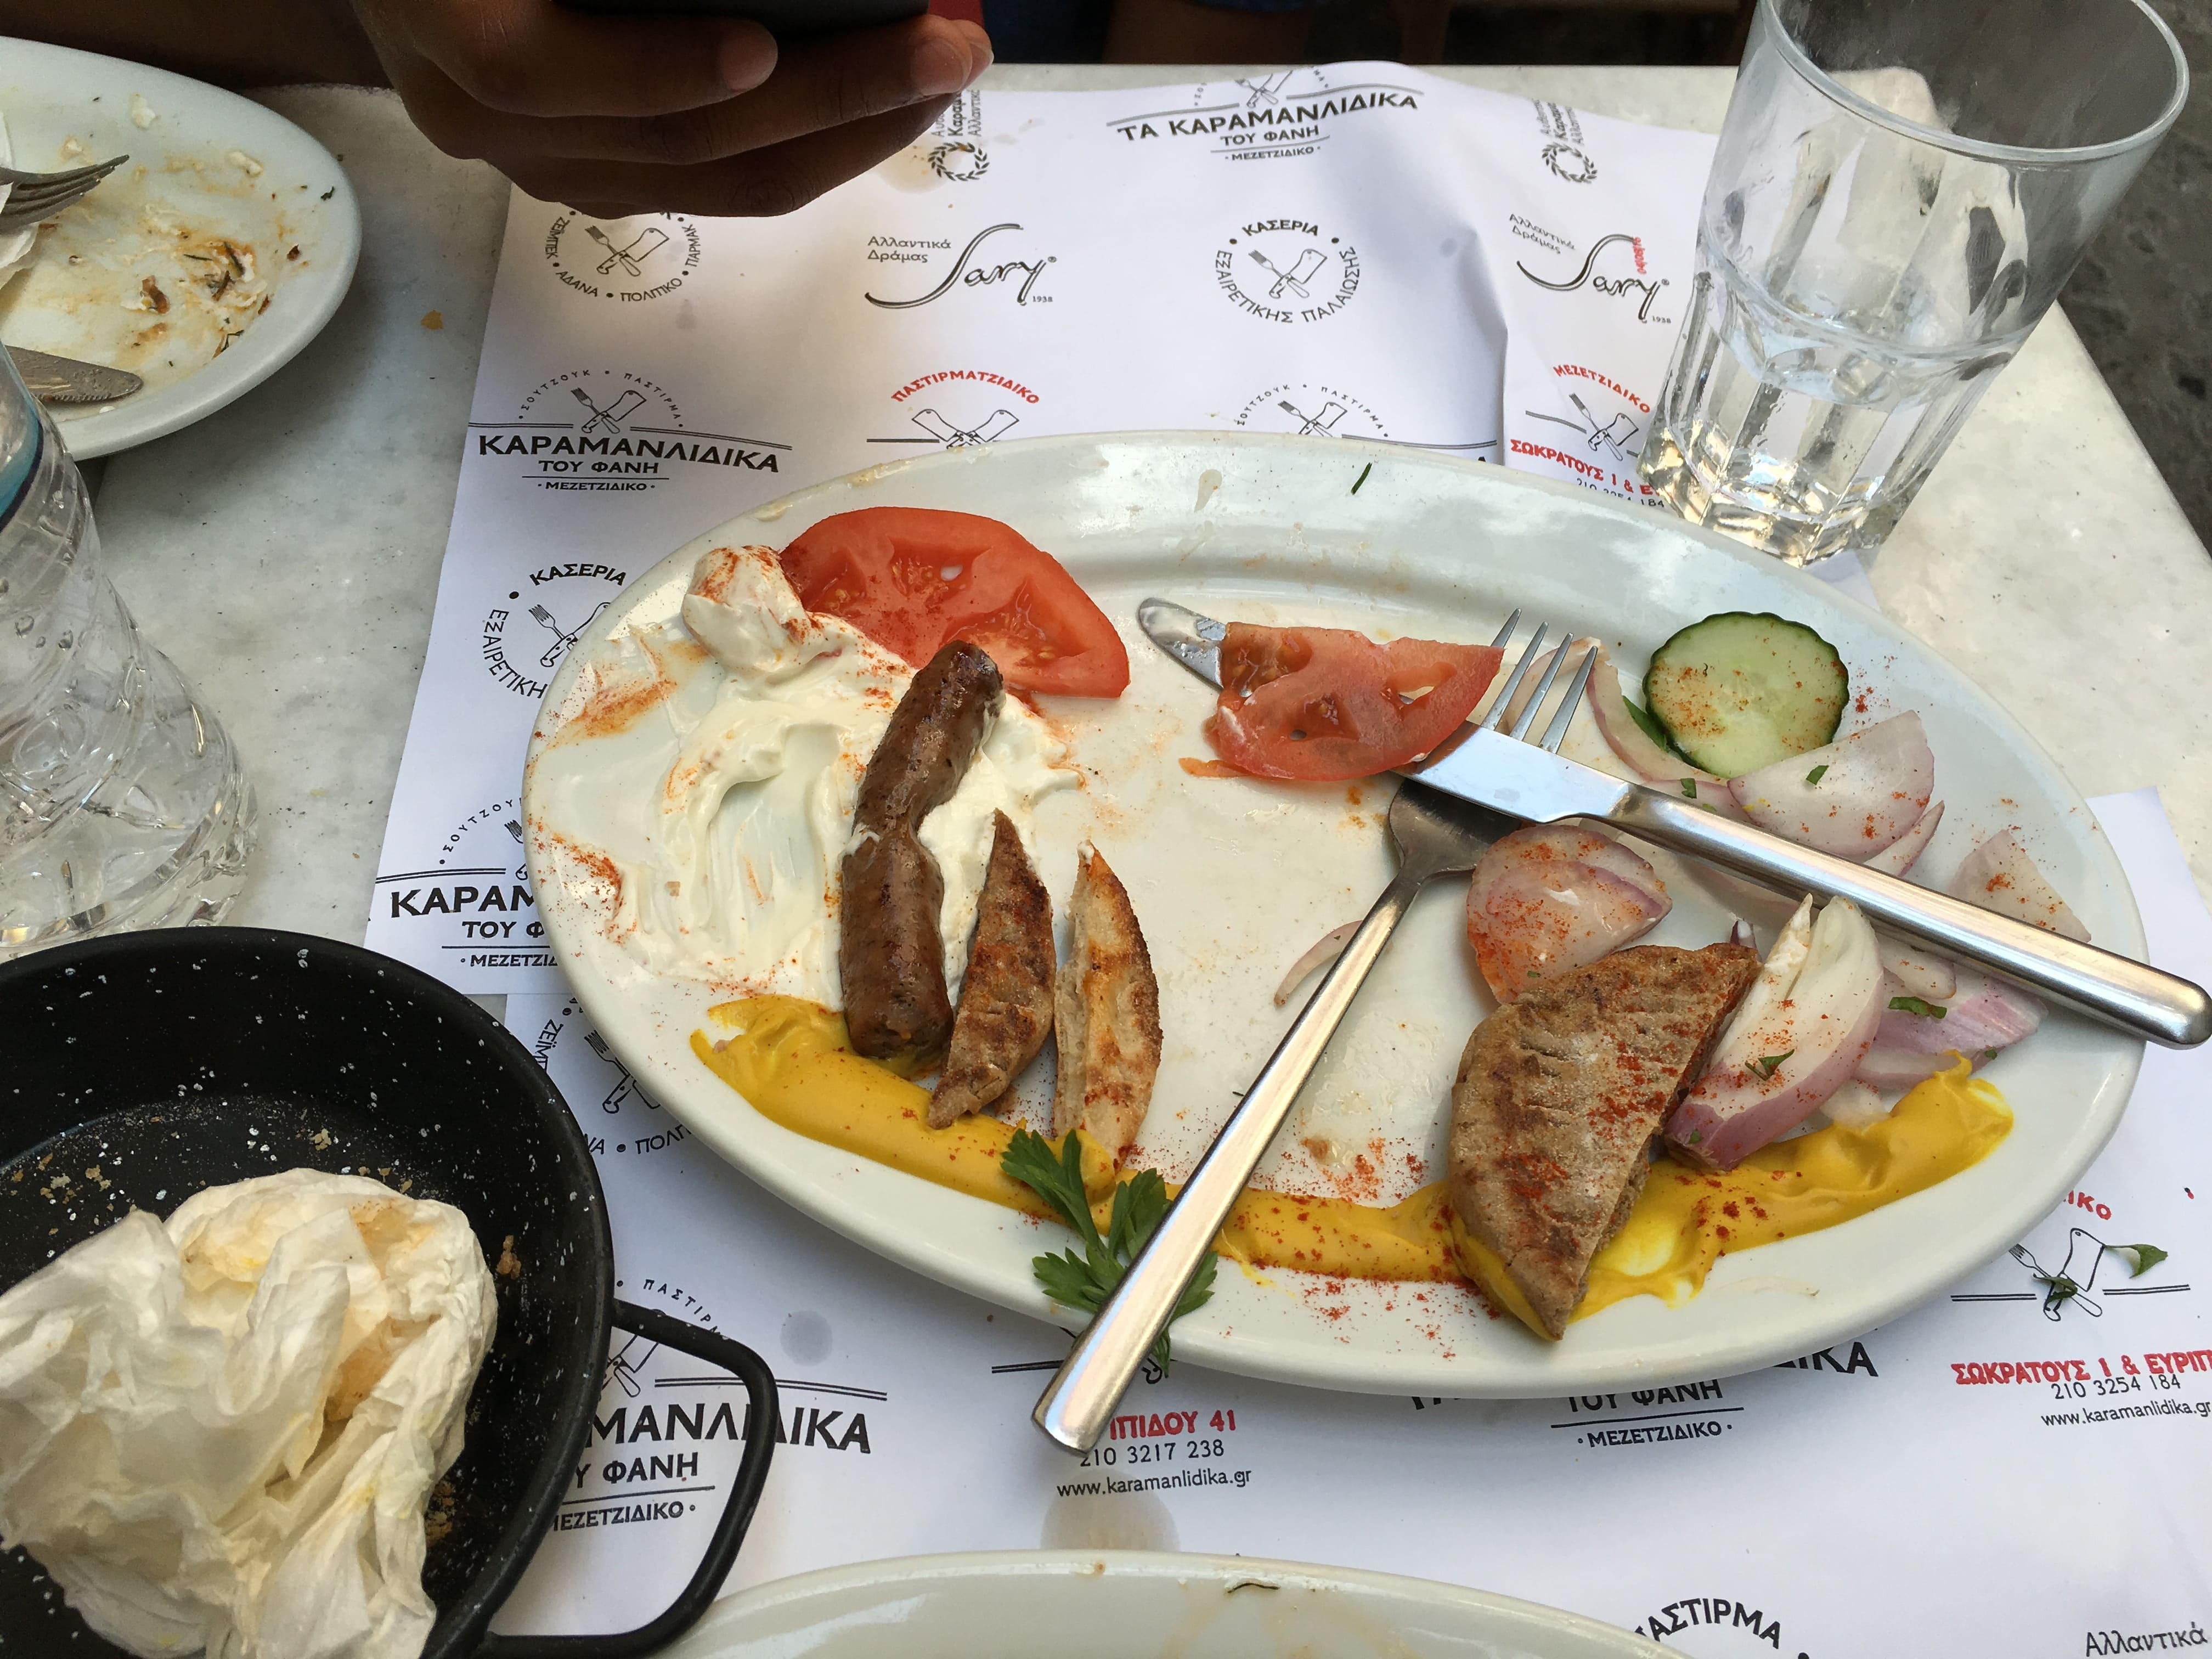 a near finished Greek meal